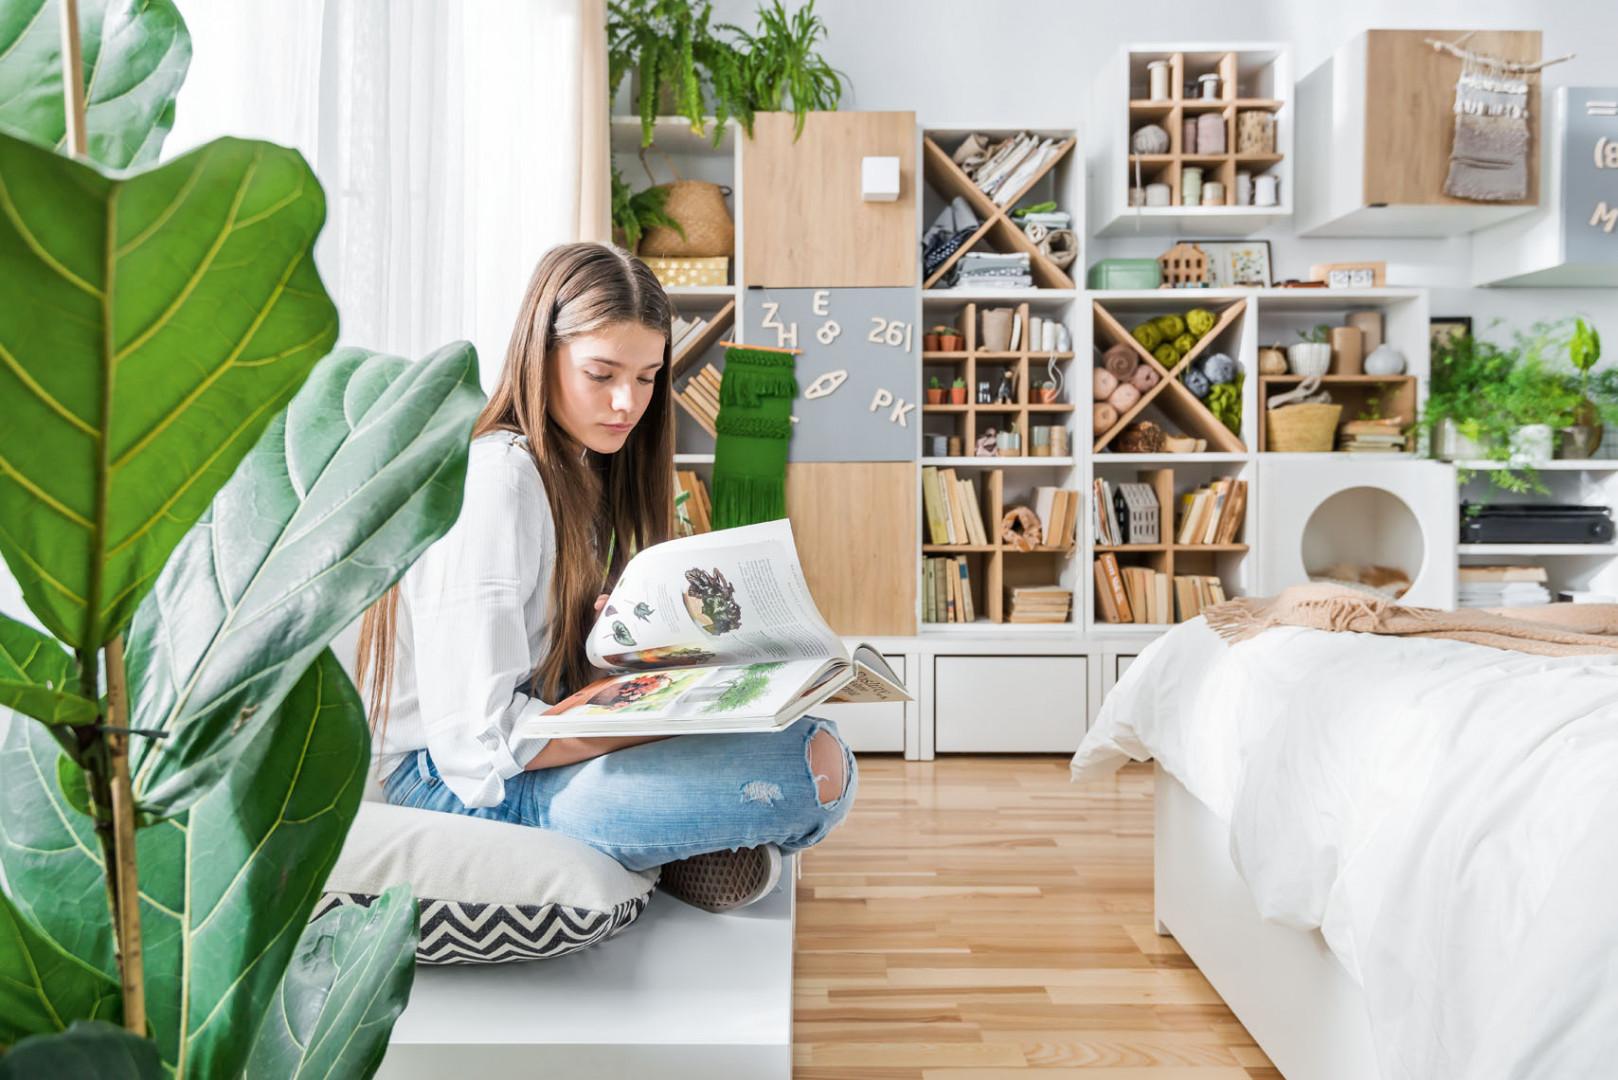 Kolekcja Young Users Eko firmy Vox. Projekt: Marta Krupińska. Fot. Vox